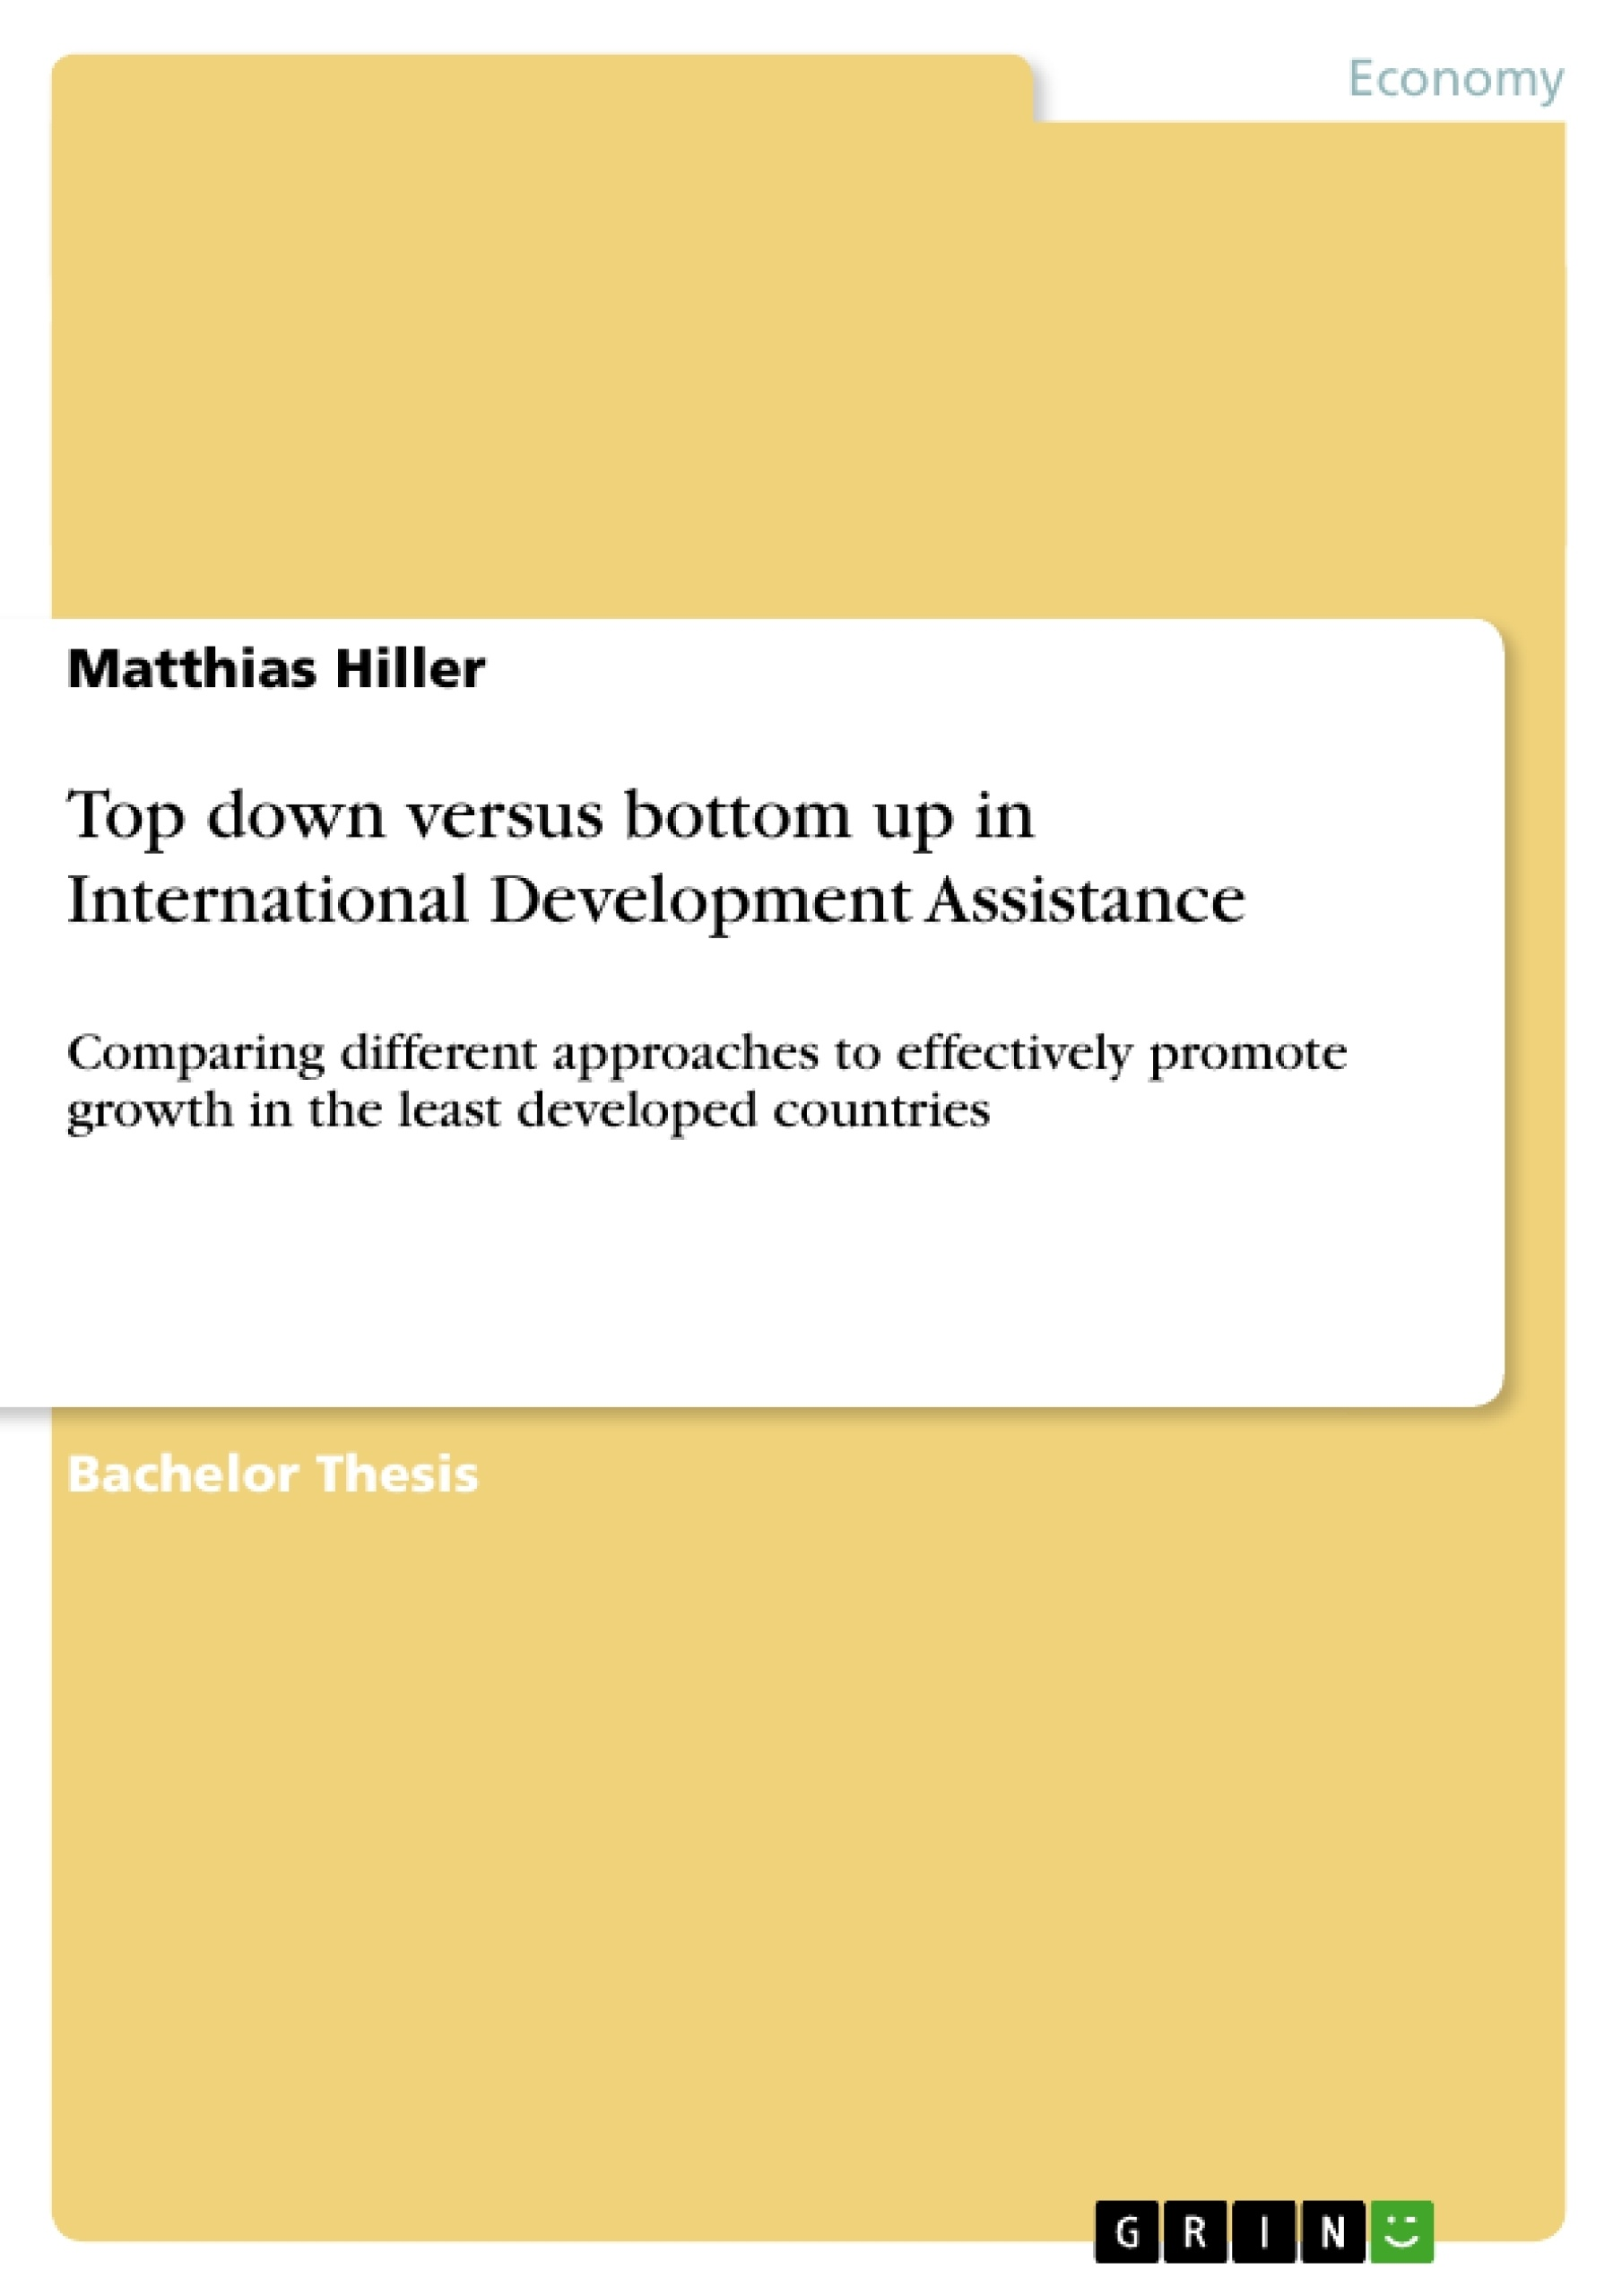 Title: Top down versus bottom up in International Development Assistance